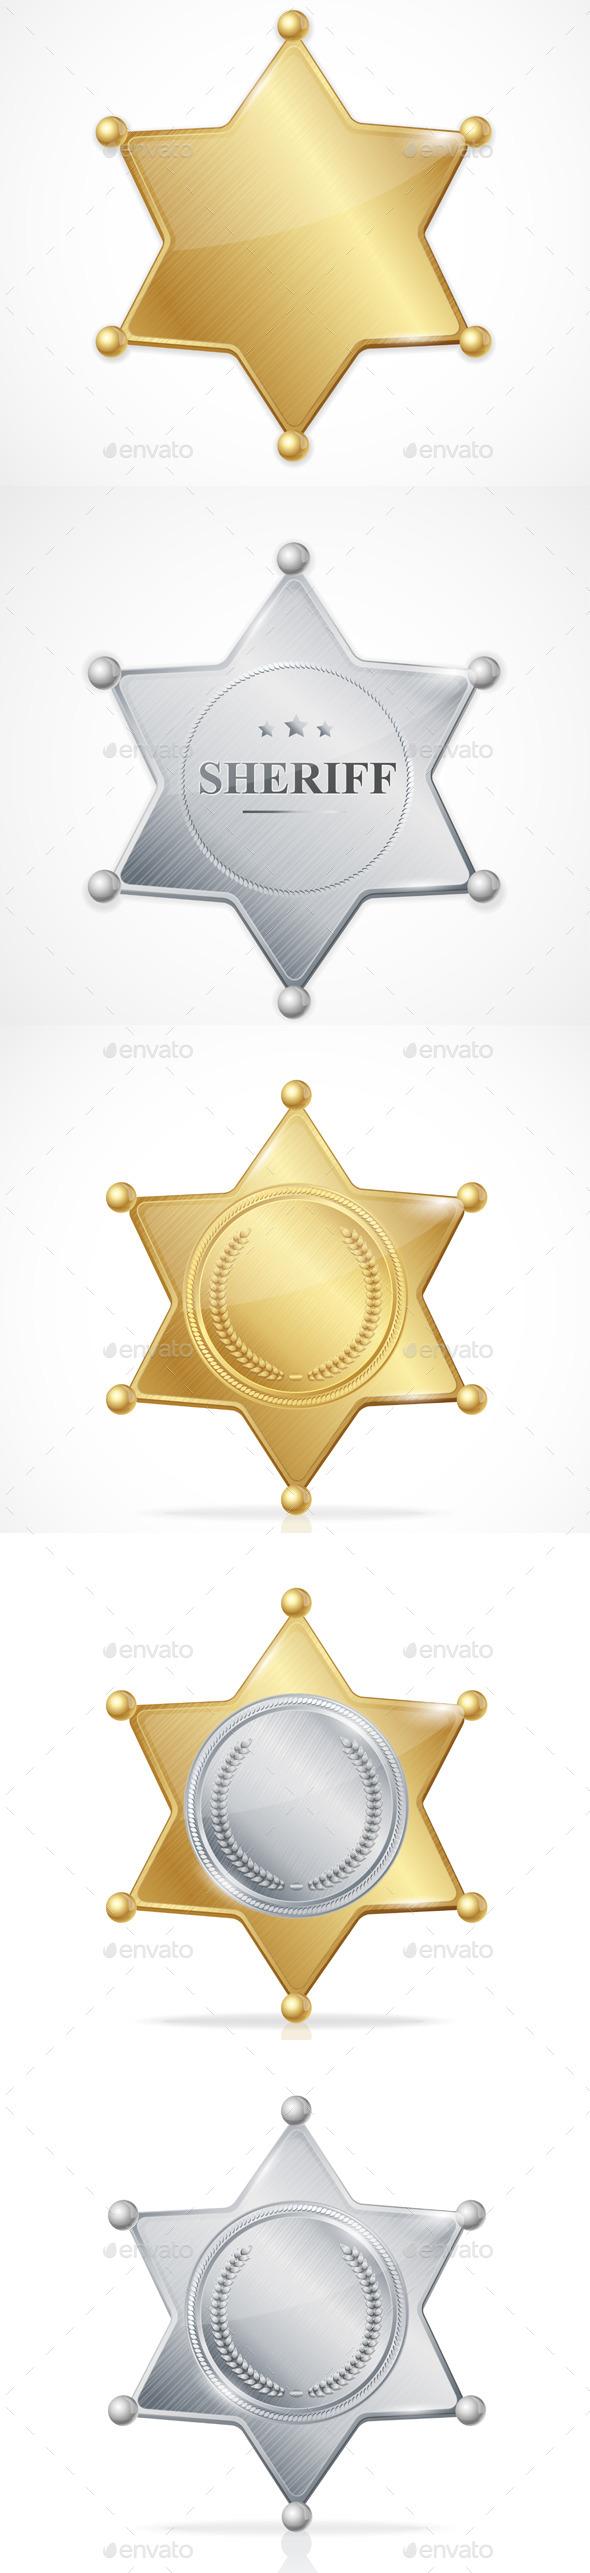 Vector Sheriff Badge Star Set - Objects Vectors